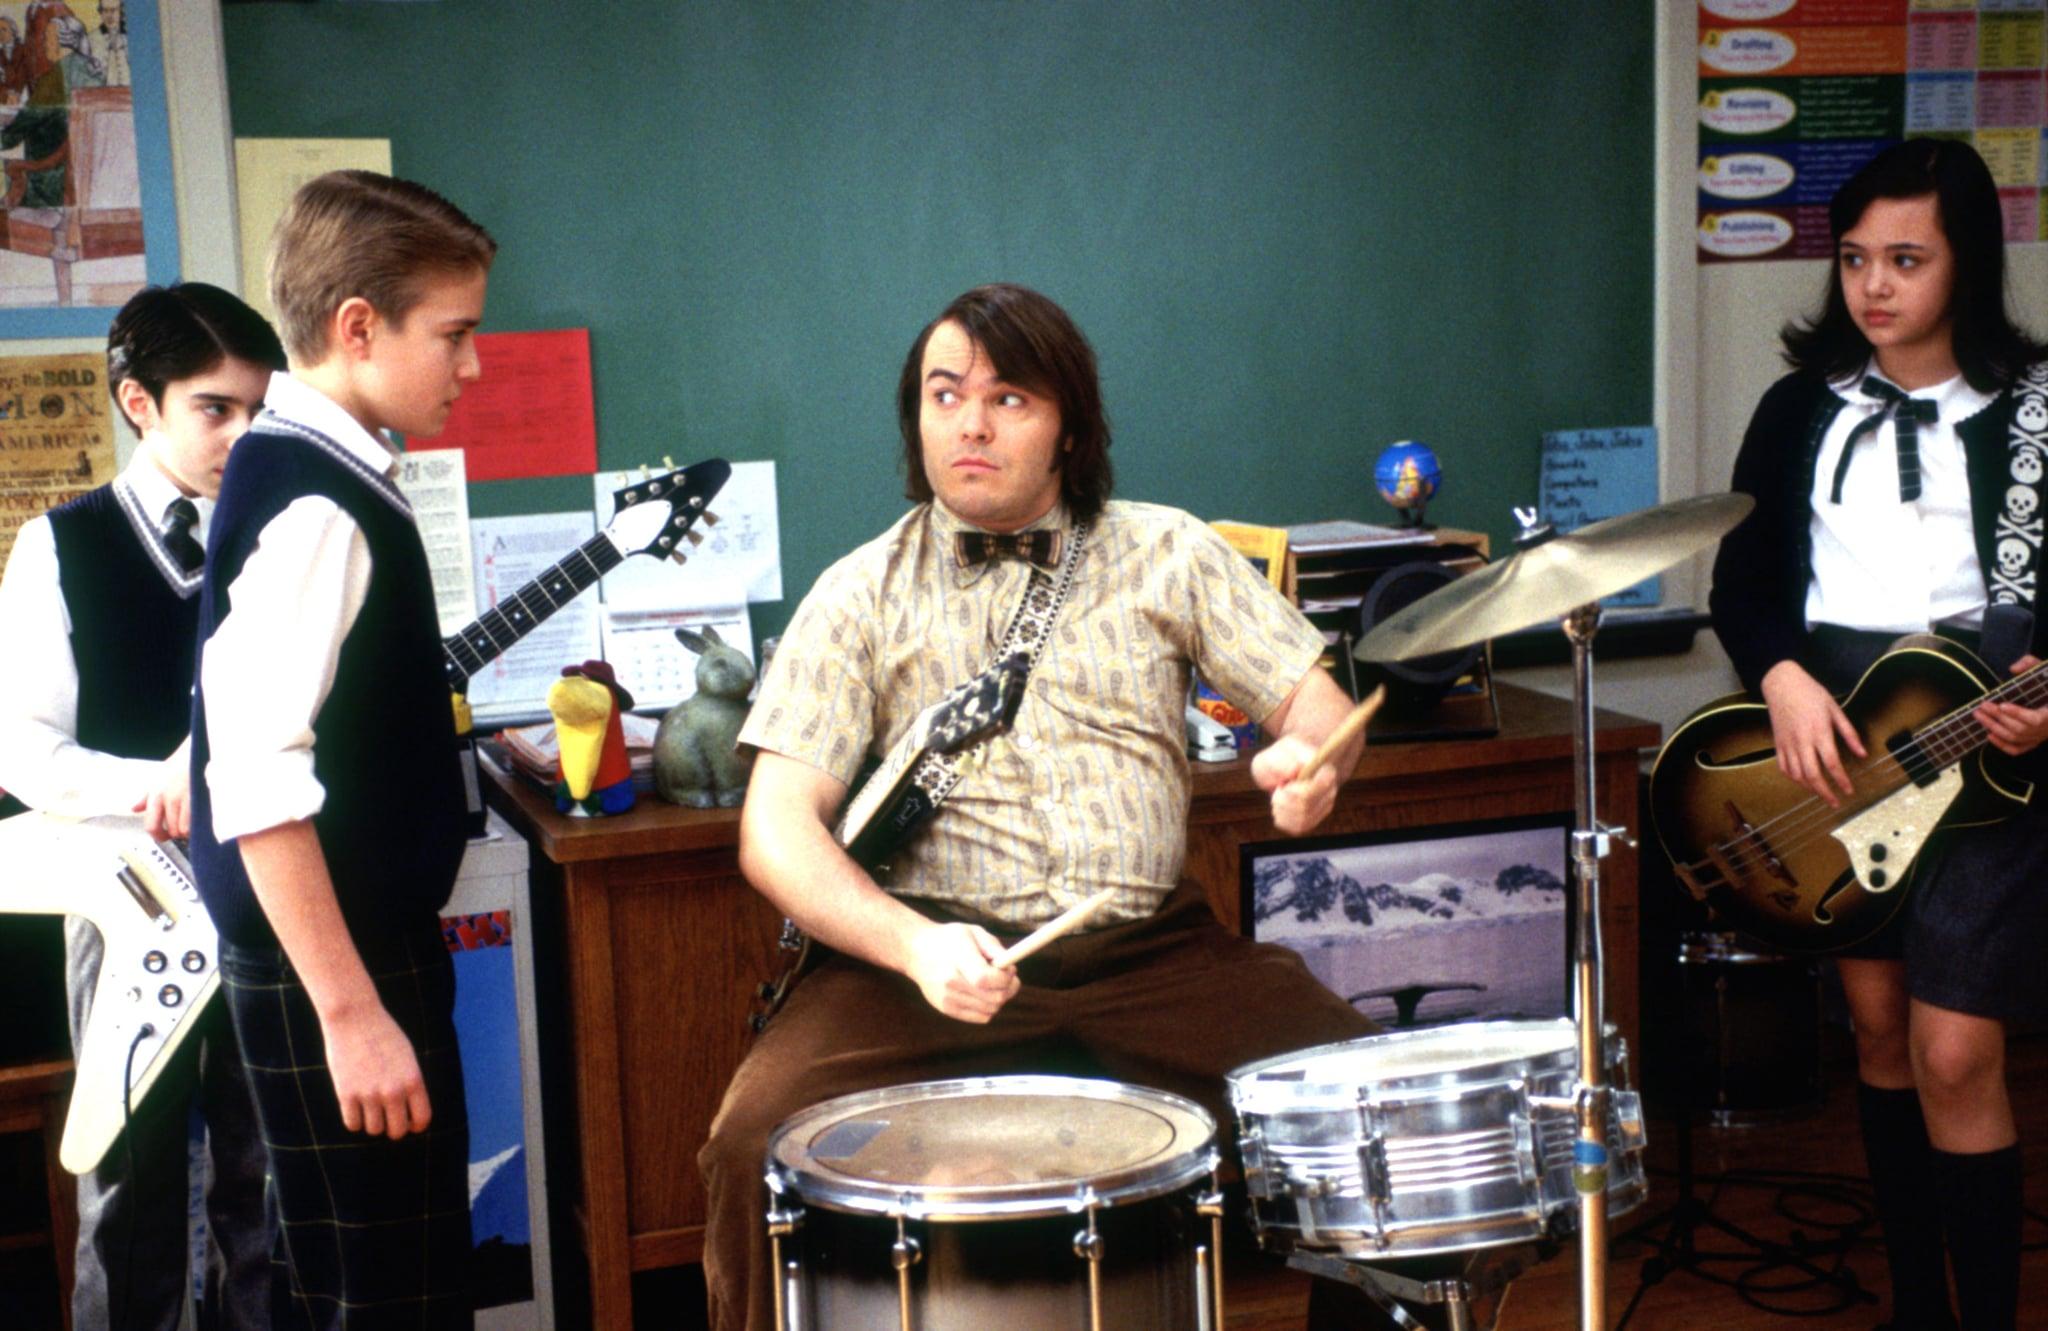 SCHOOL OF ROCK, Joey Gaydos Jr., Kevin Clark, Jack Black, Rebecca Brown, 2003, (c) Paramount/courtesy Everett Collection